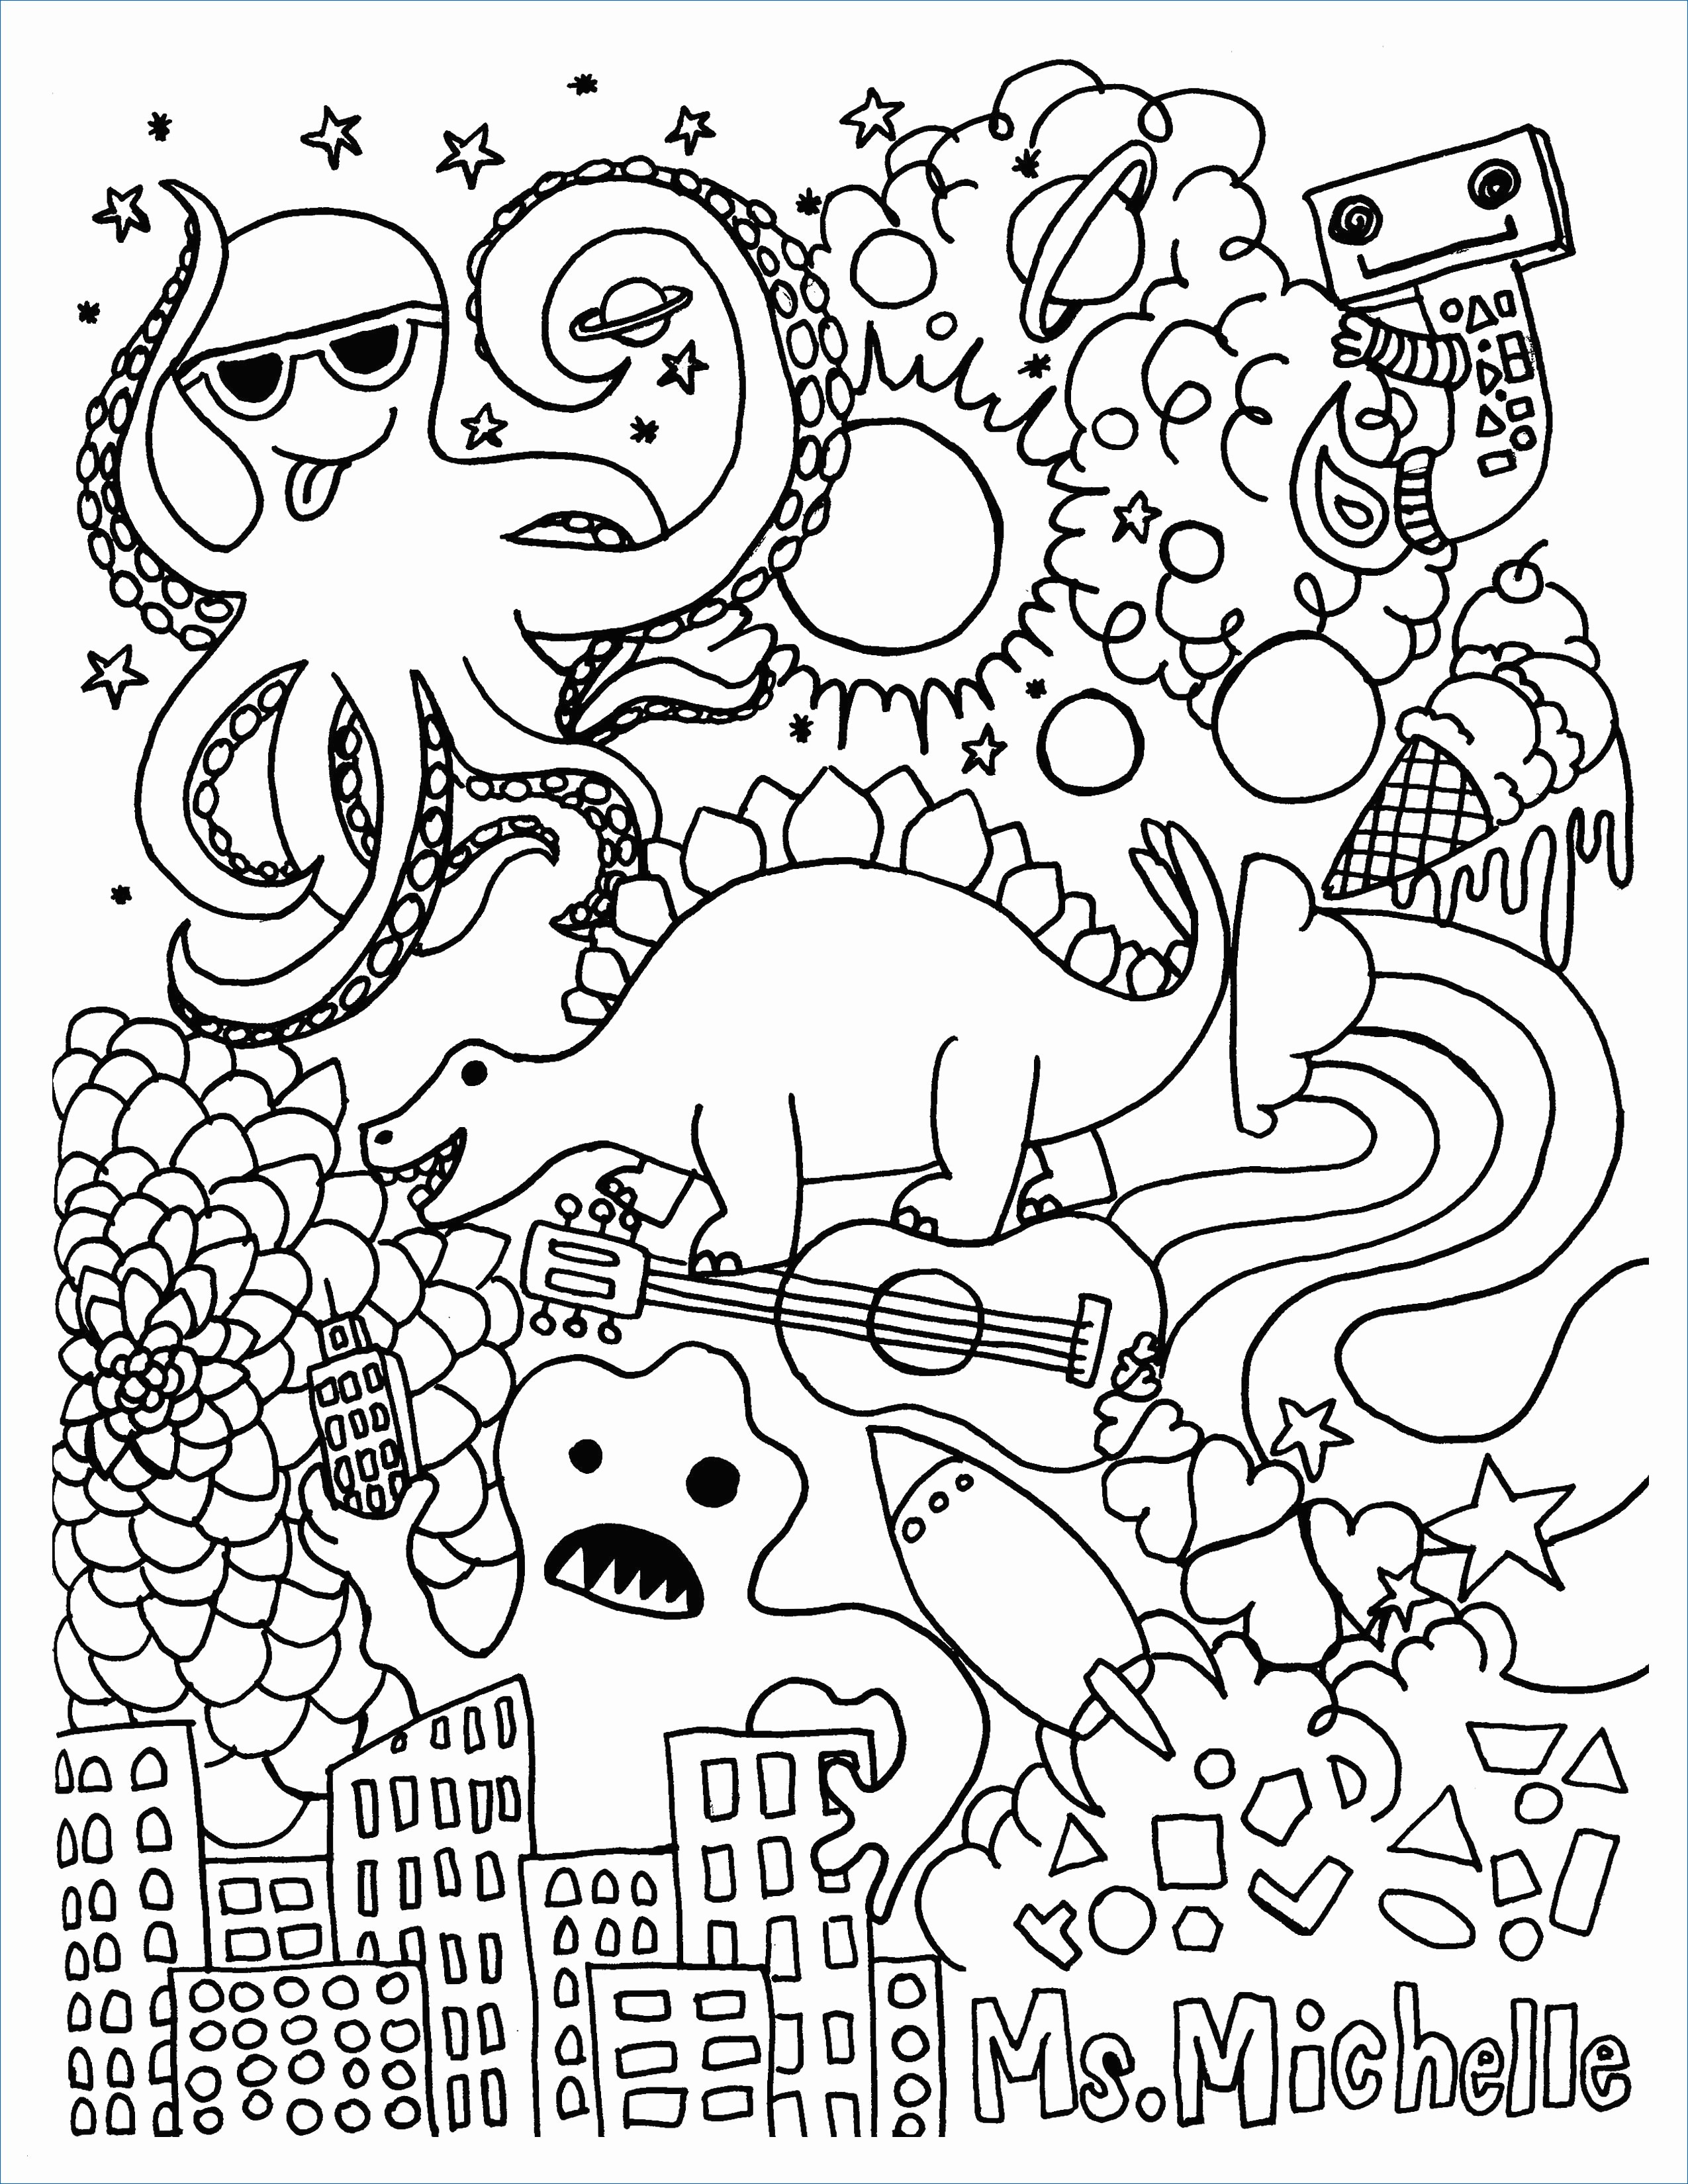 Ausmalbild Mia and Me Das Beste Von Coloring for Me Best 40 Mia Me Ausmalbilder Scoredatscore Fotografieren